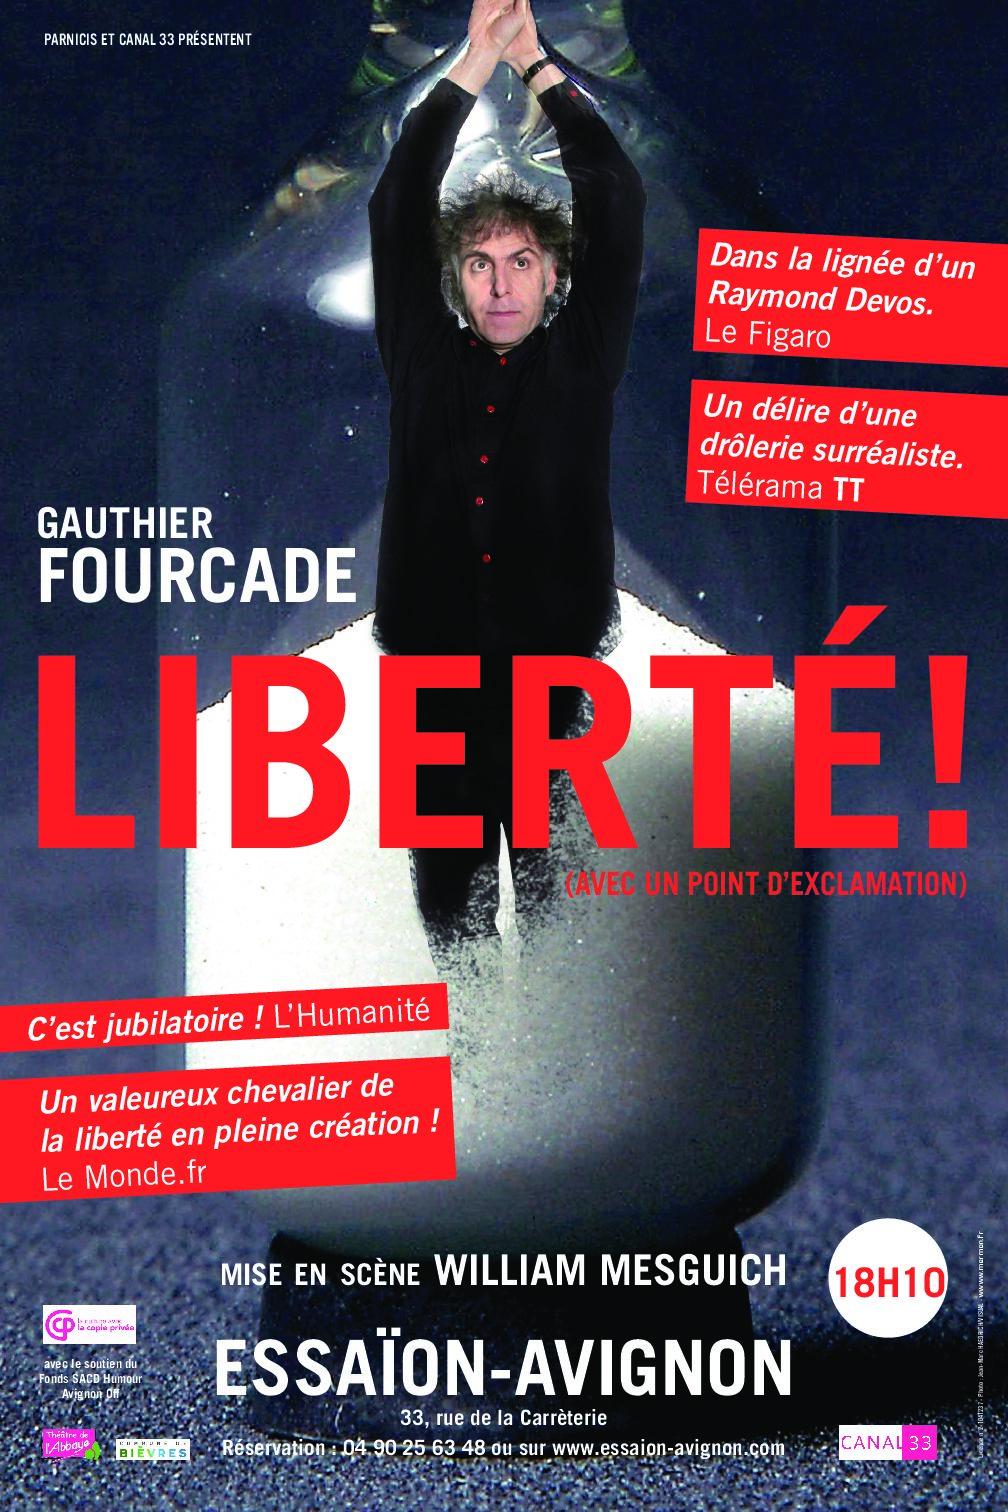 Liberté ! (avec un point d'exclamation) Avignon 21 // Diffusion